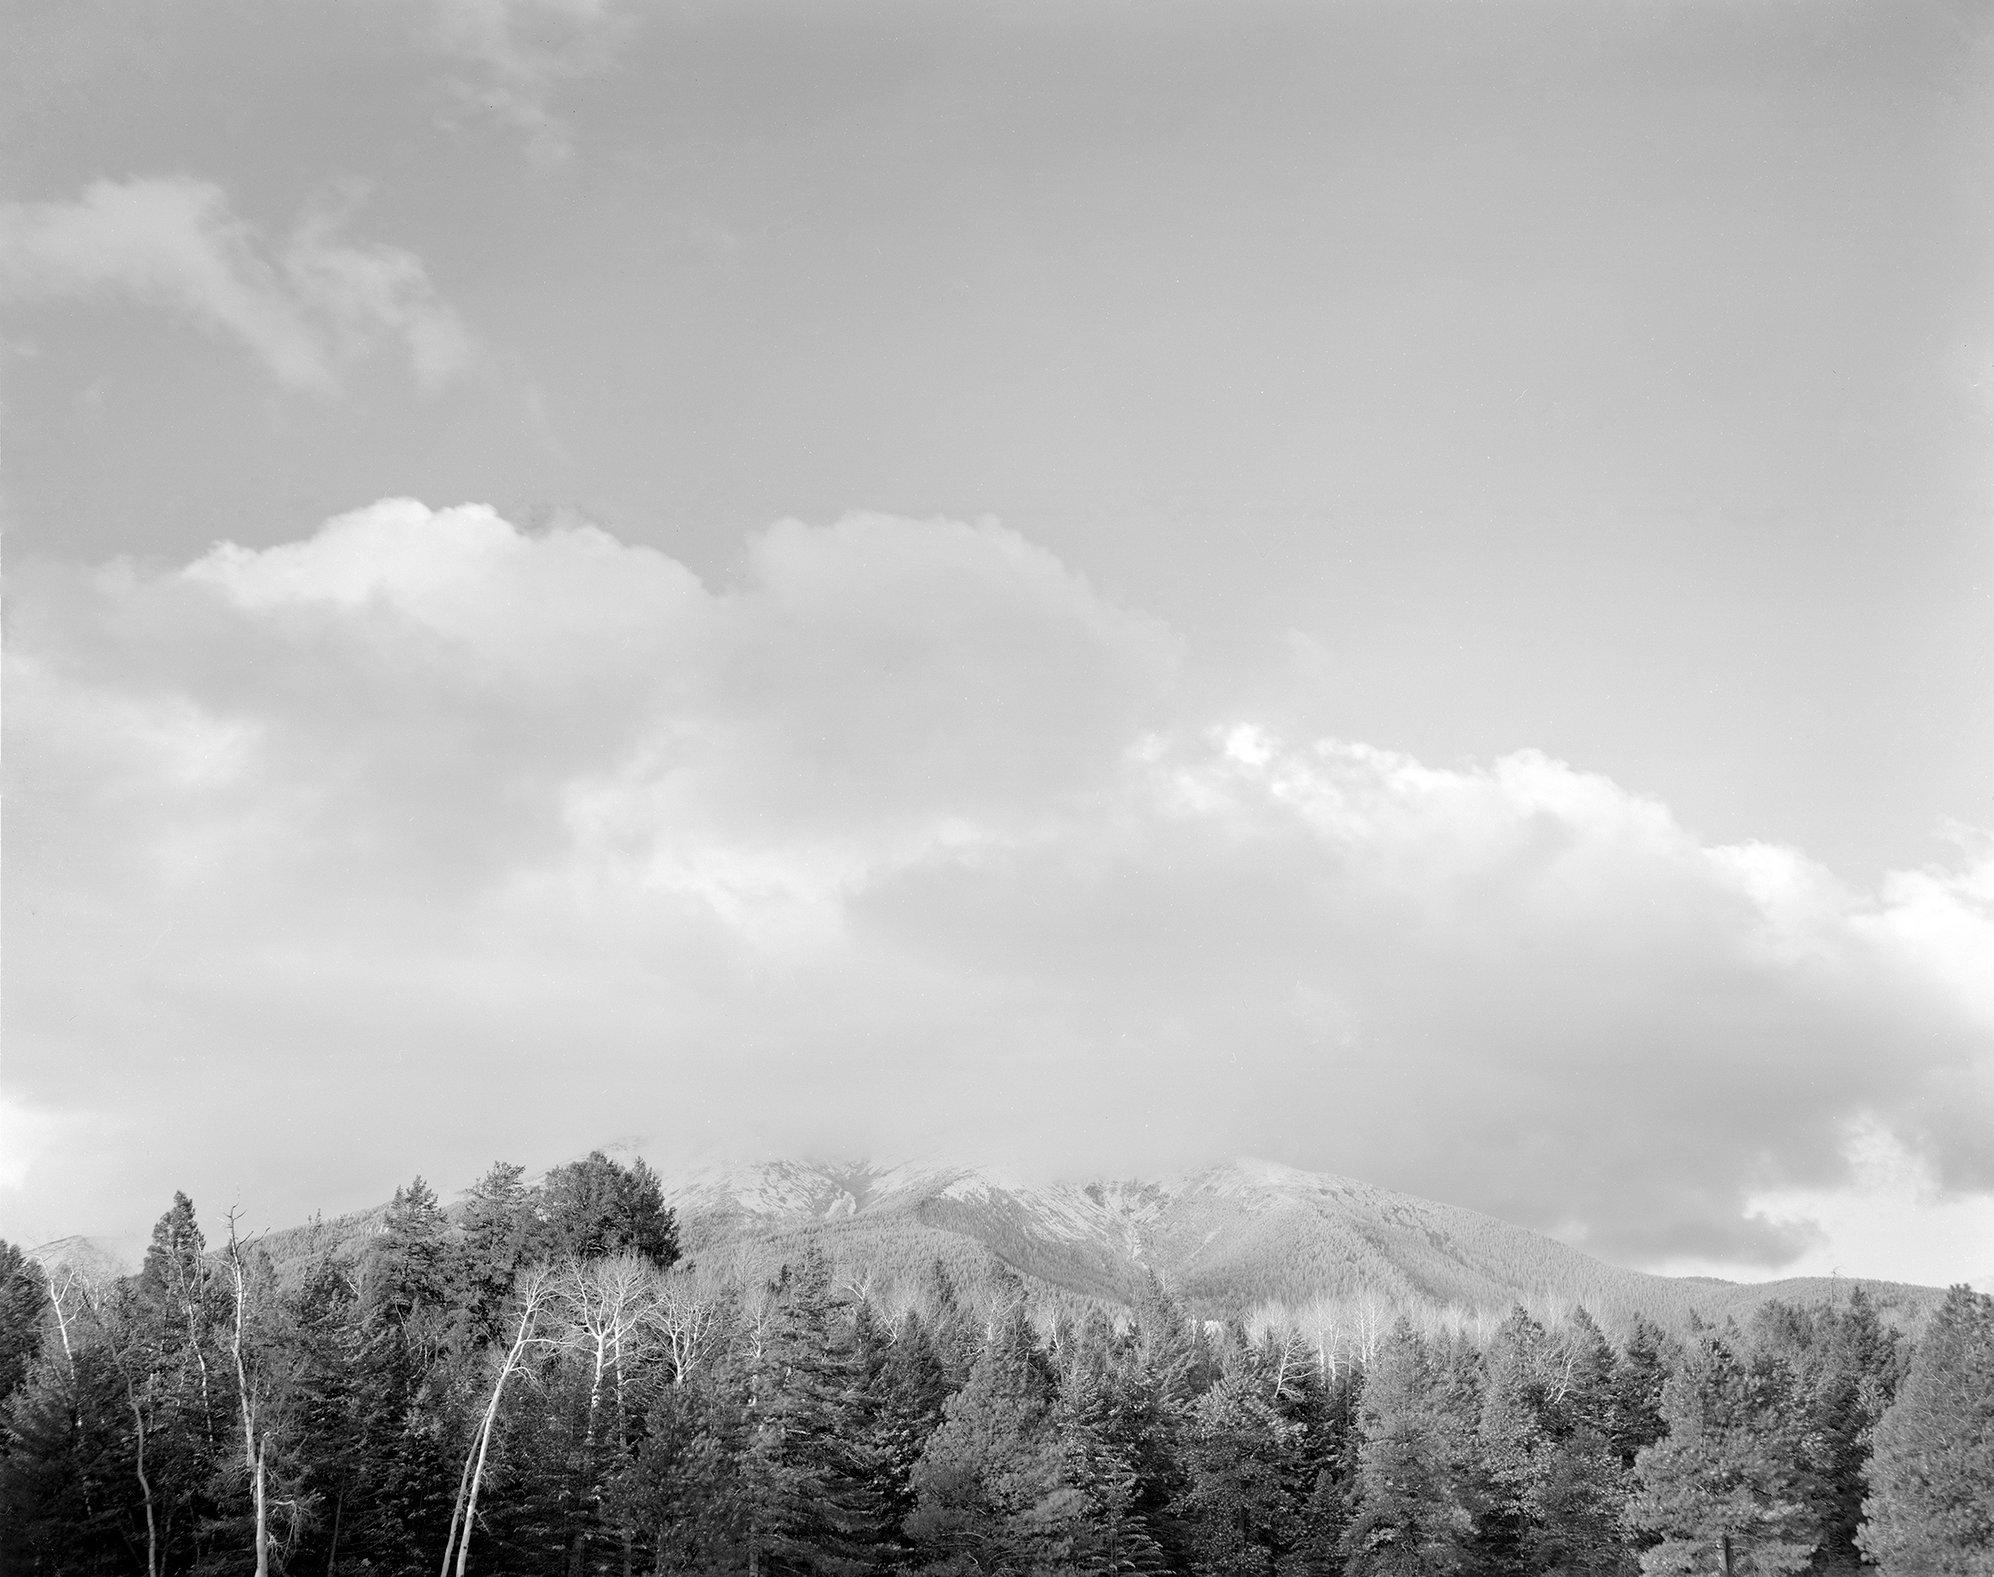 0001_Hidden Peaks, San Francisco Peaks, Flagstaff, Arizona. Summer 2009..tif